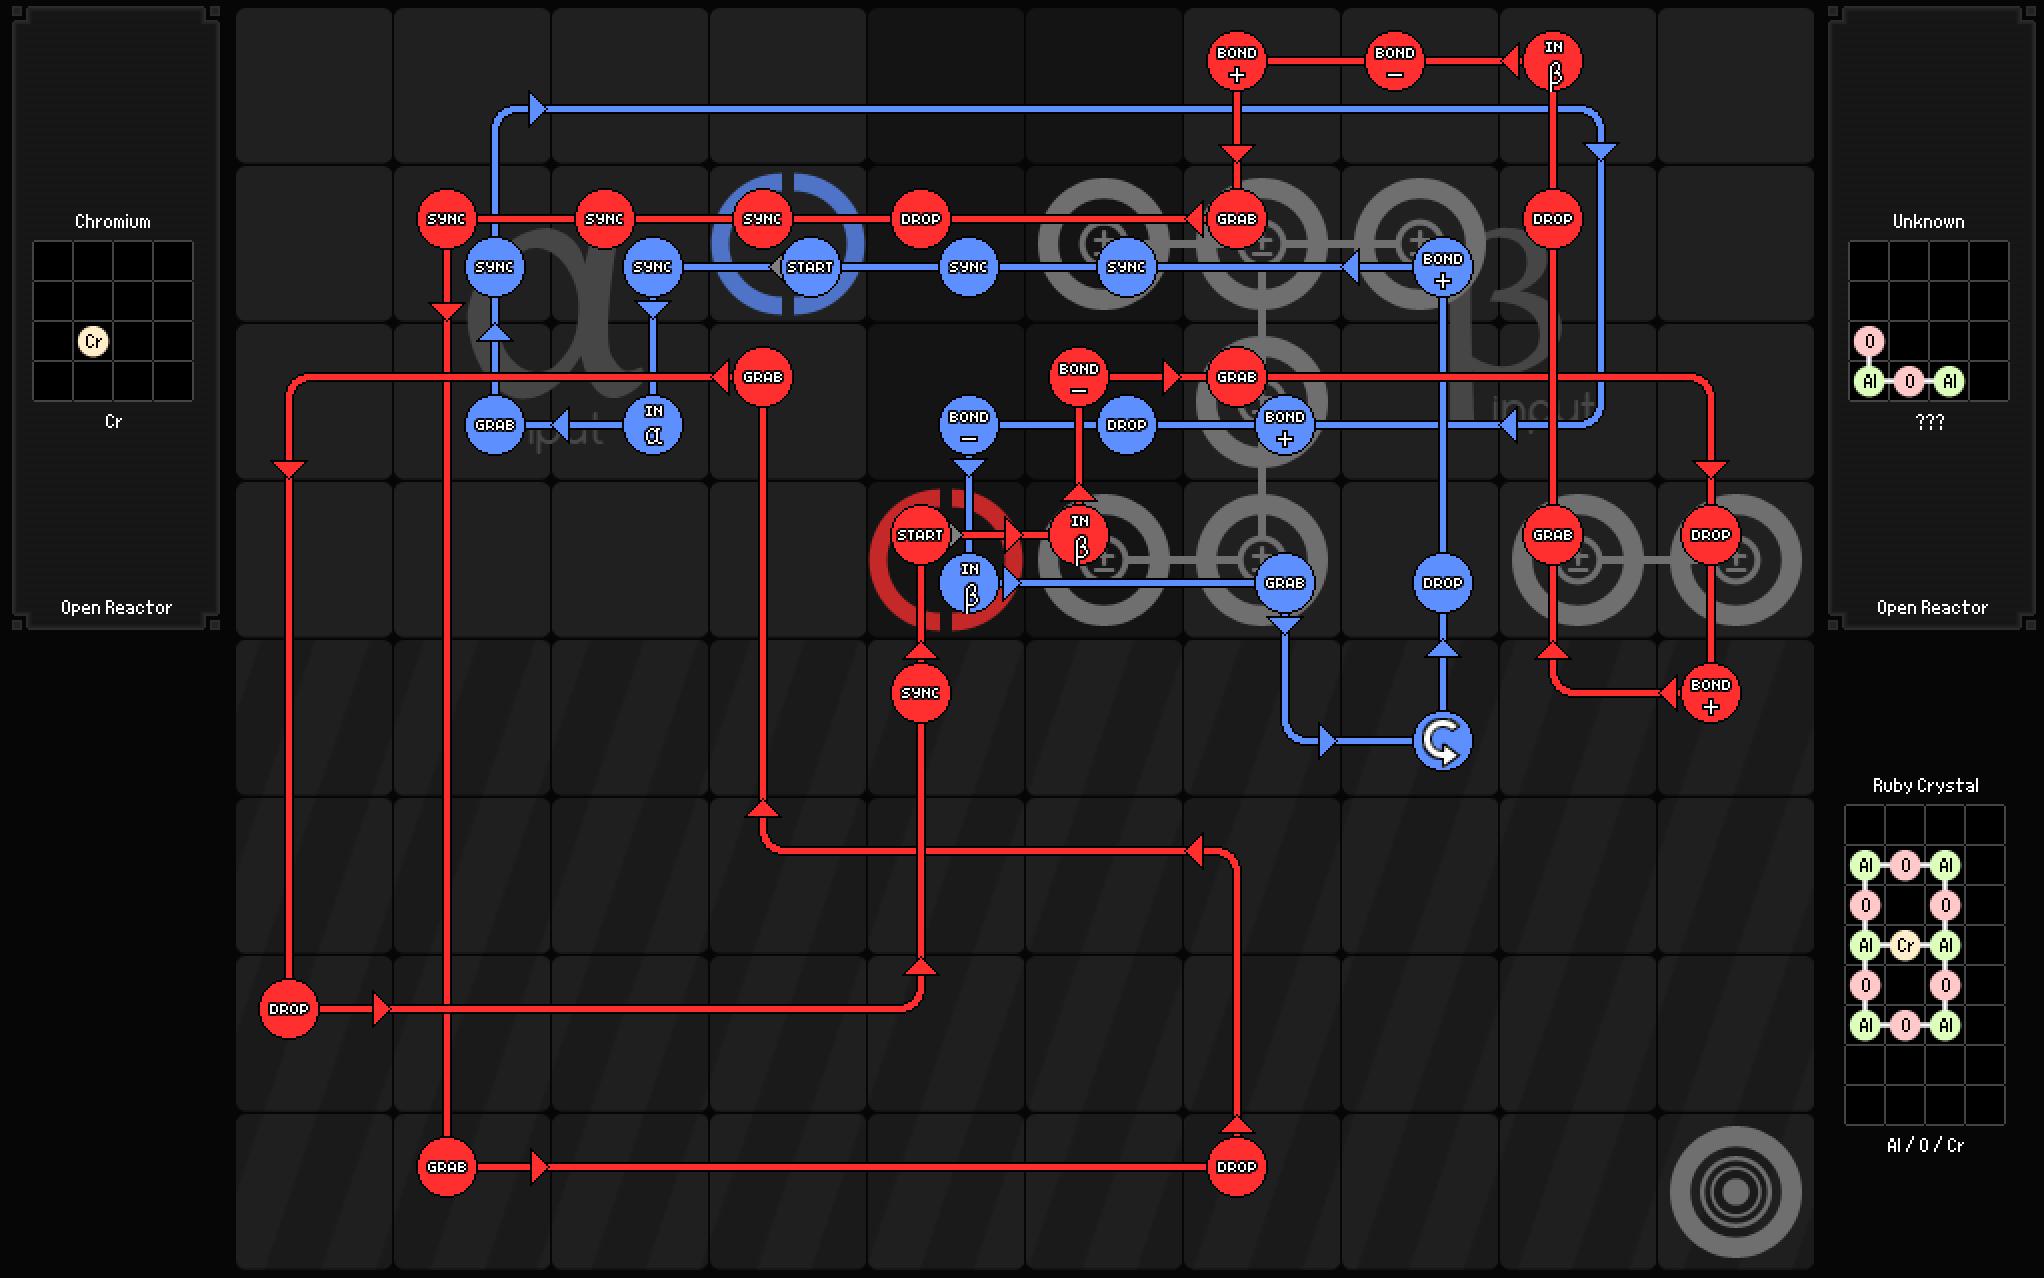 1_Story_Mode/6_Hephaestus_IV/SpaceChem-6.8.a-boss/Reactor_3.png